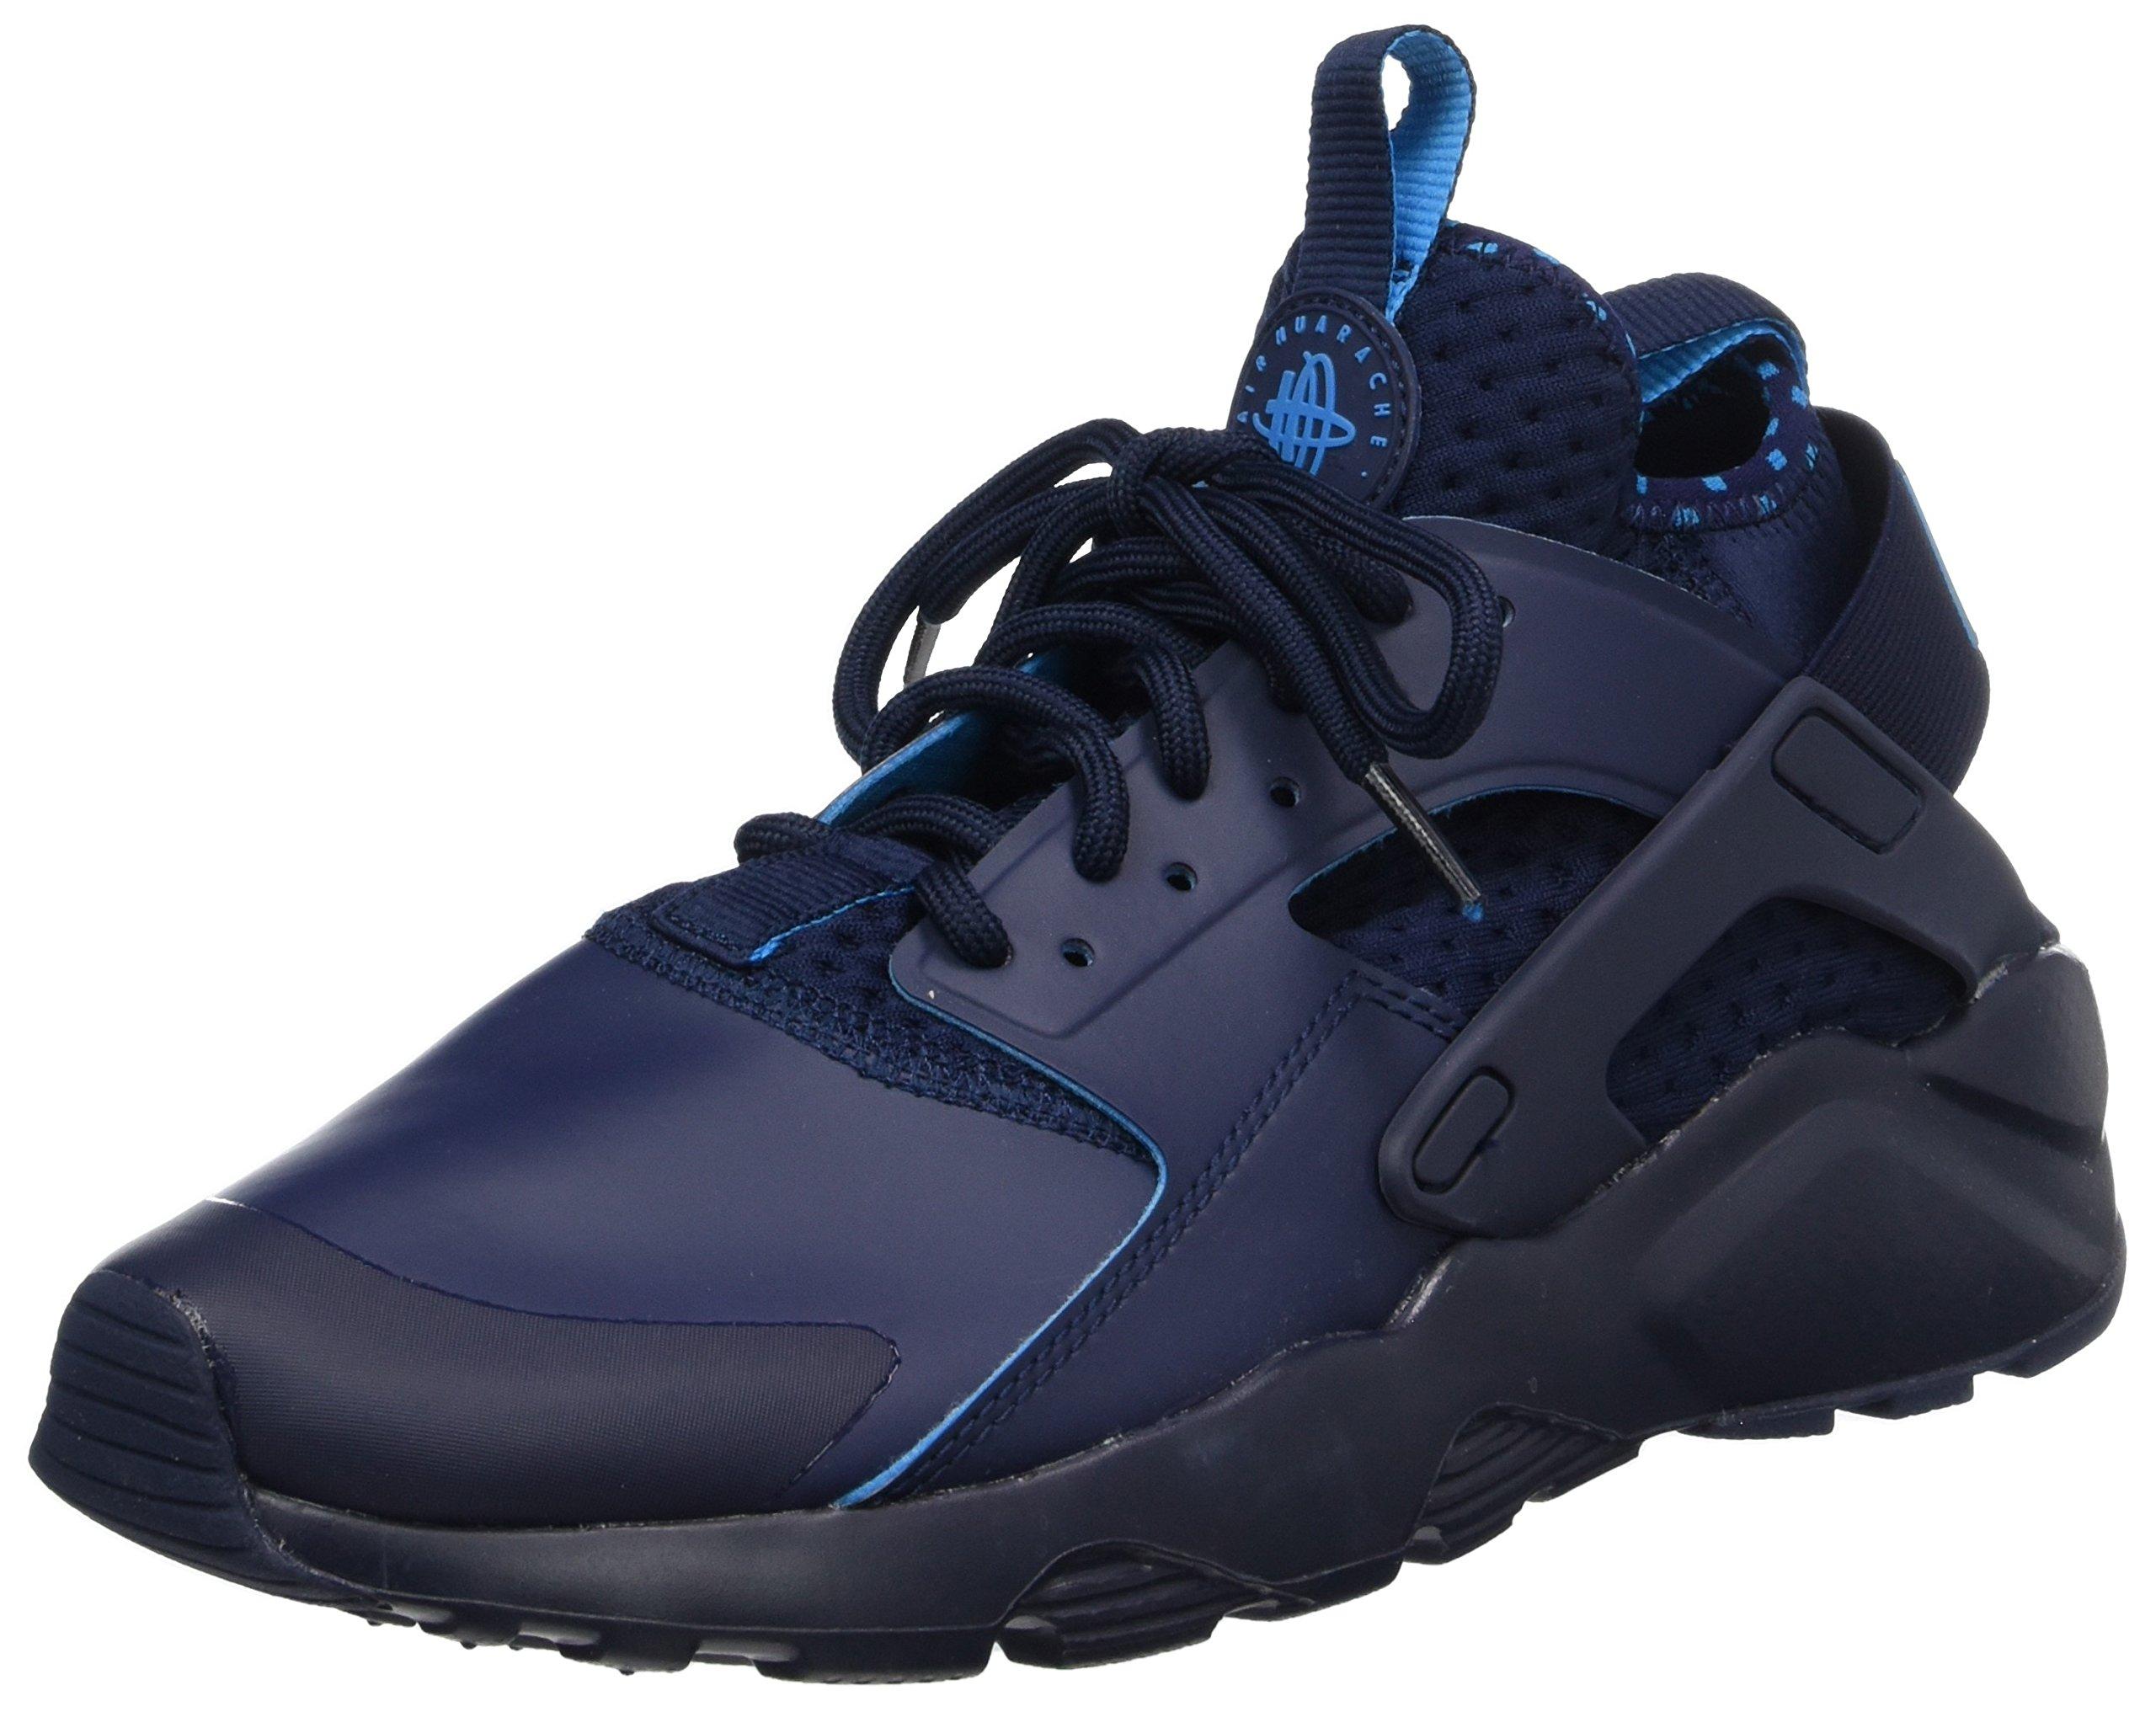 NIKE Air Huarache Run Ultra SE Mens Running Shoes (12 D(M) US) by NIKE